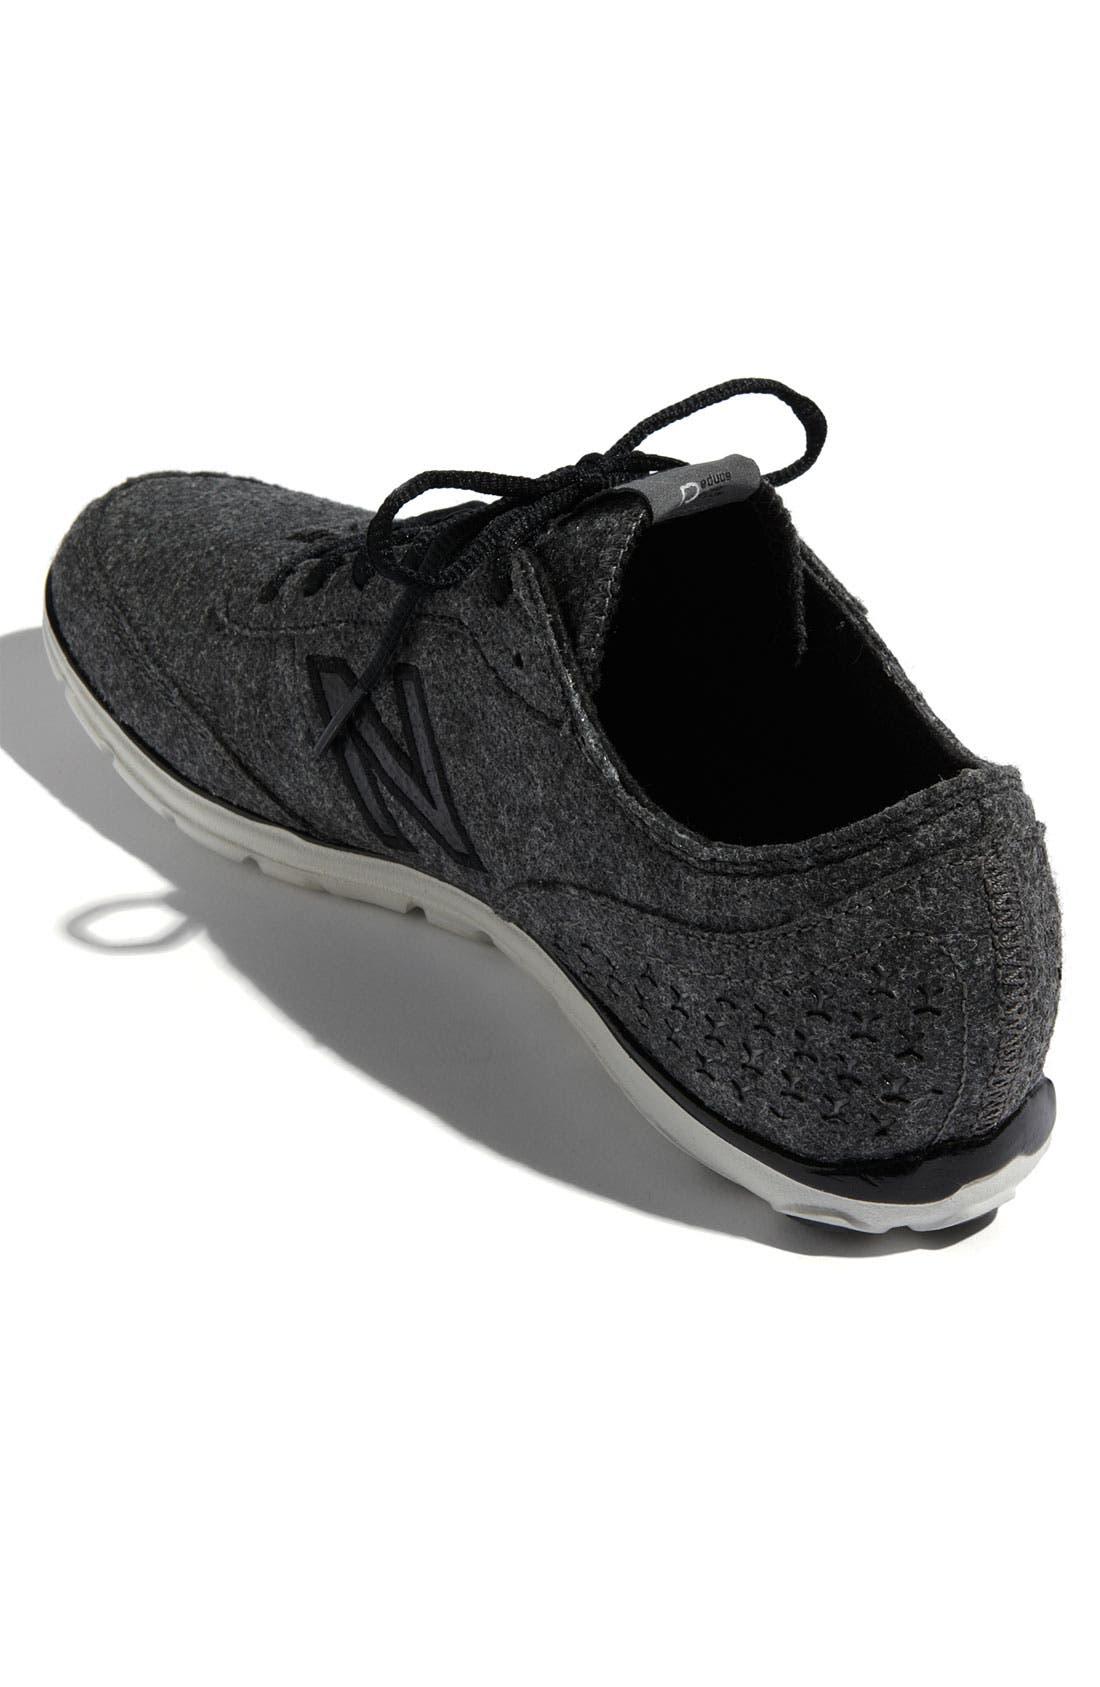 Alternate Image 3  - New Balance 'newSKY' Sneaker (Men)